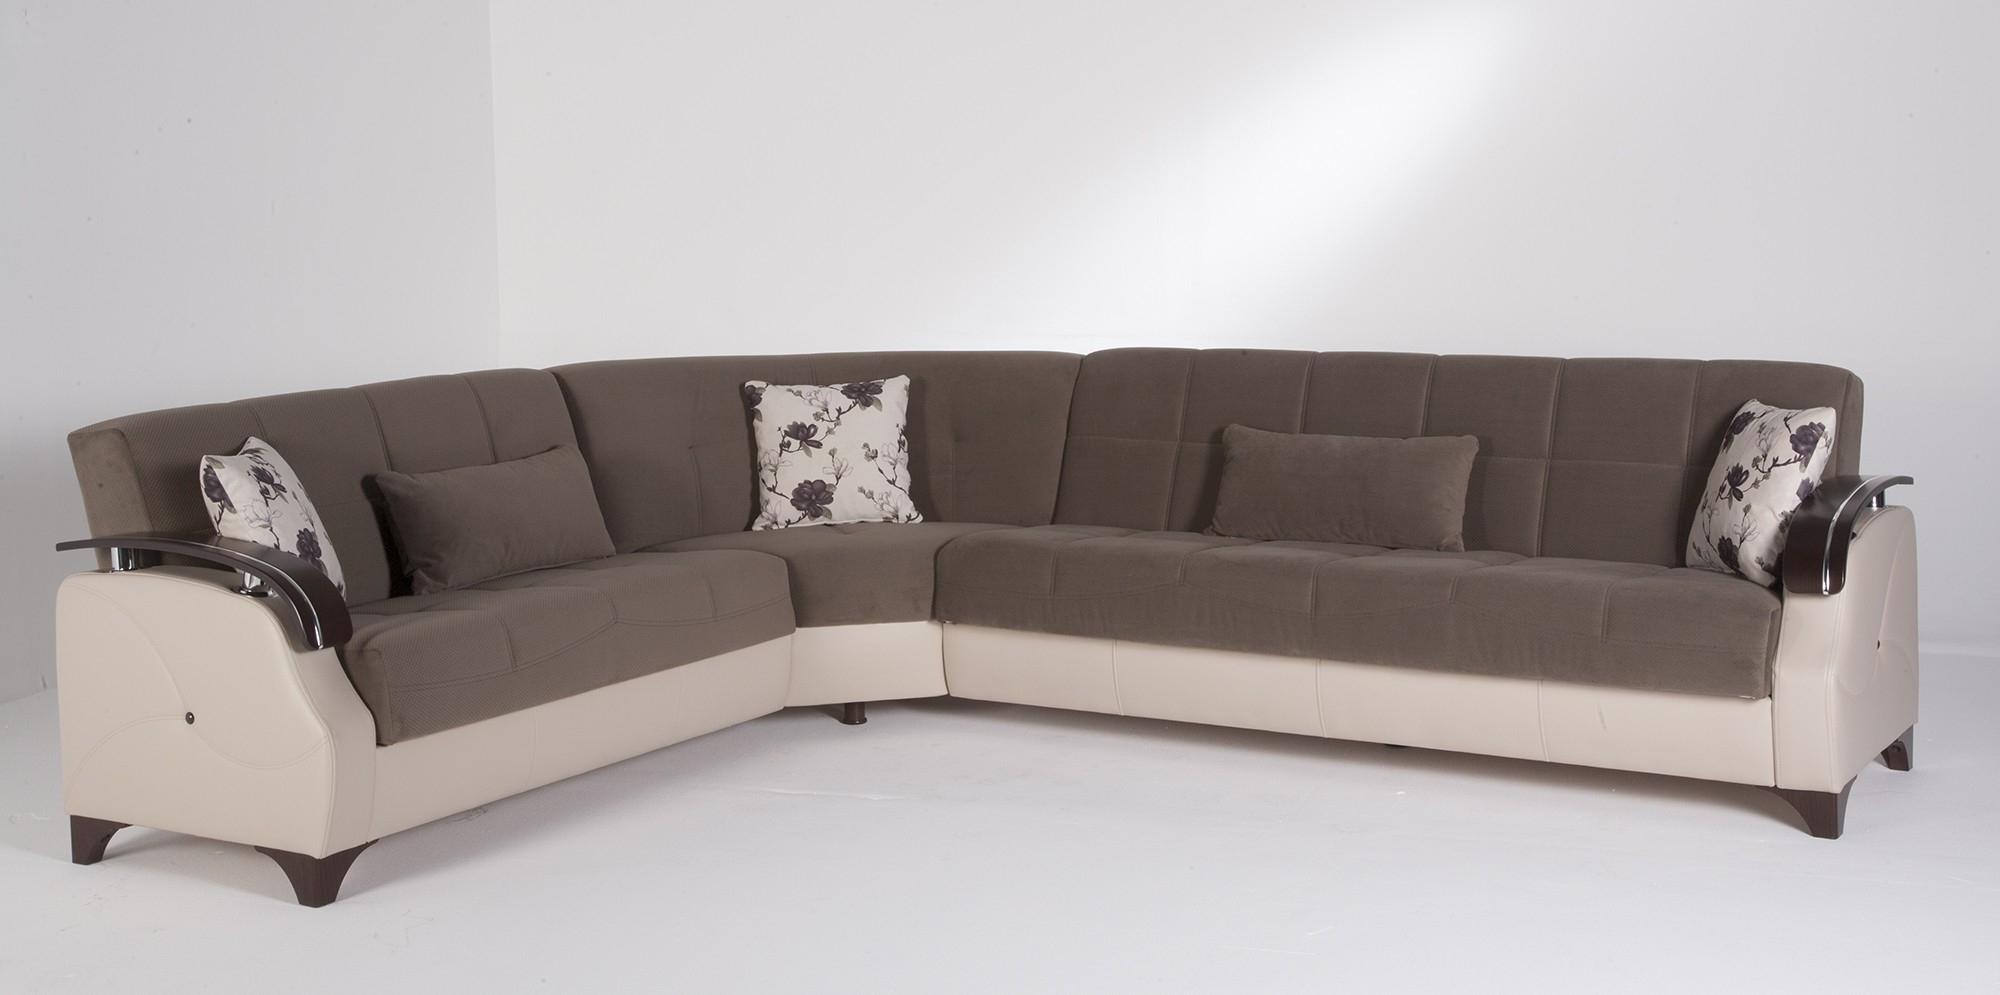 Furniture : Mattress Firm Zephyrhills Zephyrhills Fl Mattress Firm Inside Most Current Nashua Nh Sectional Sofas (View 8 of 20)